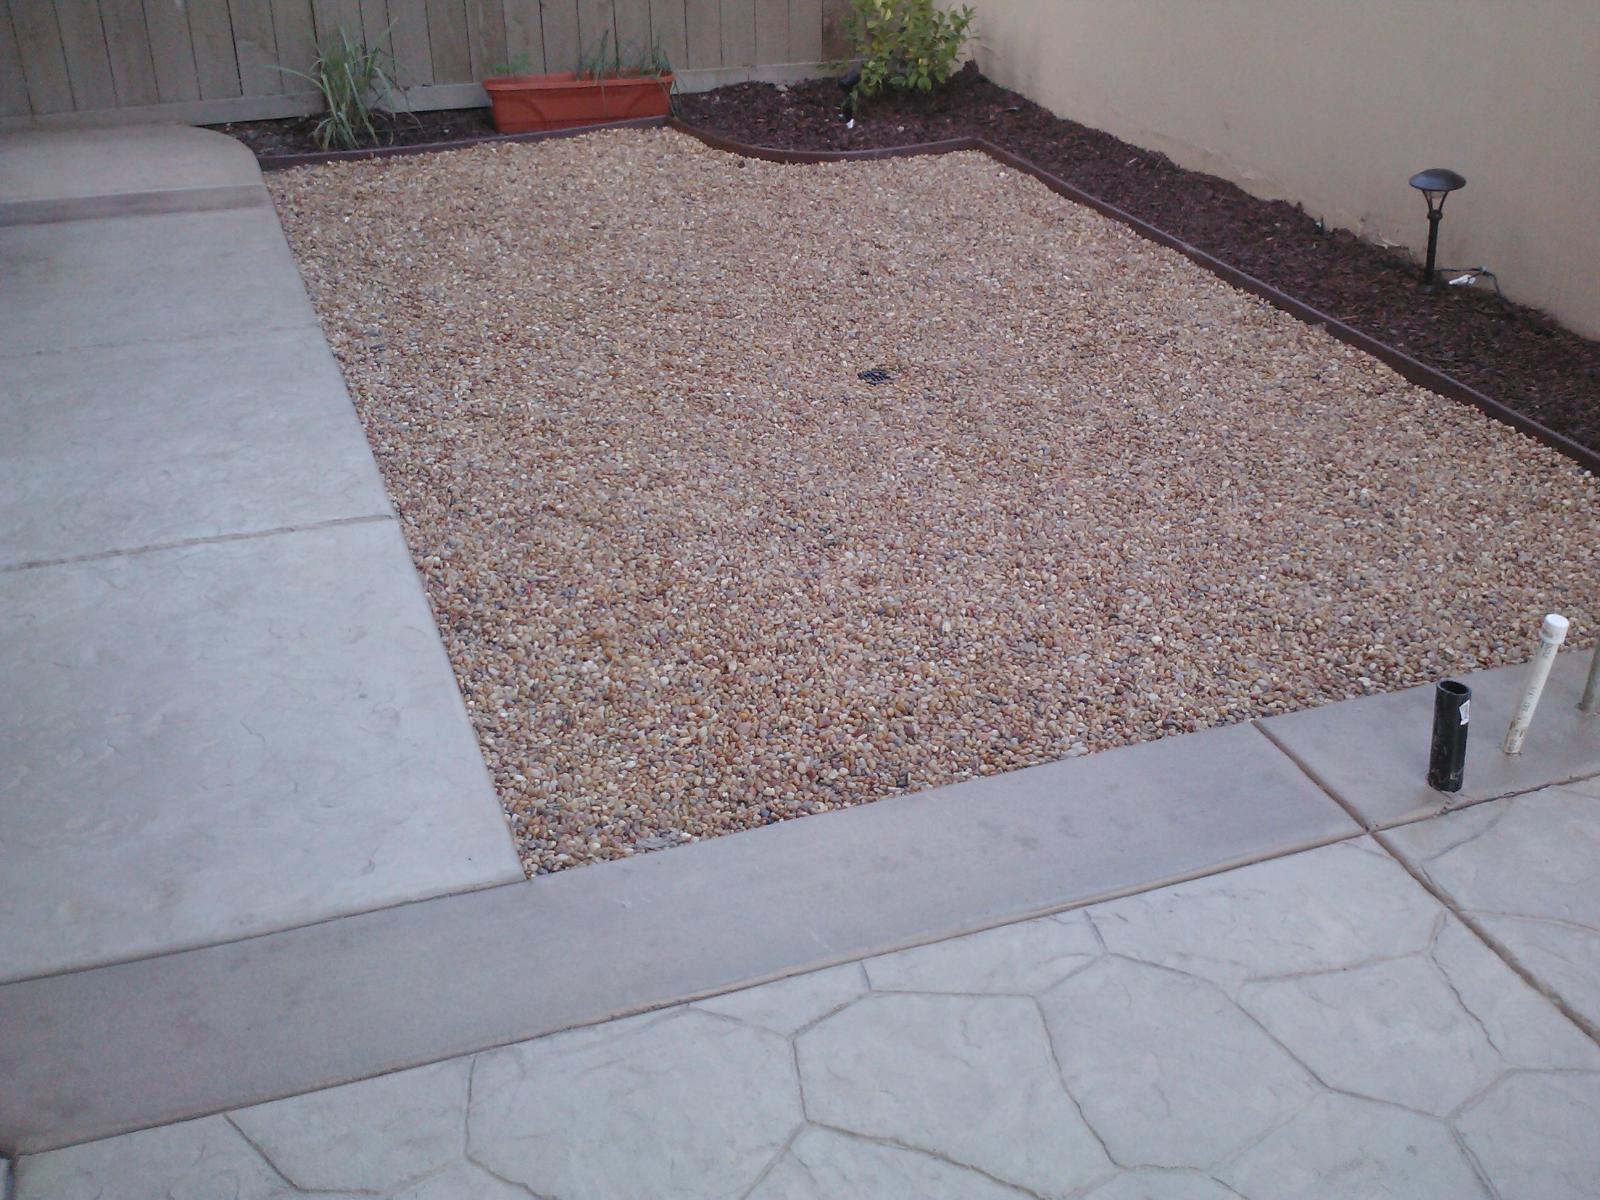 Concrete Companies In San Diego, Concrete Companies San Diego